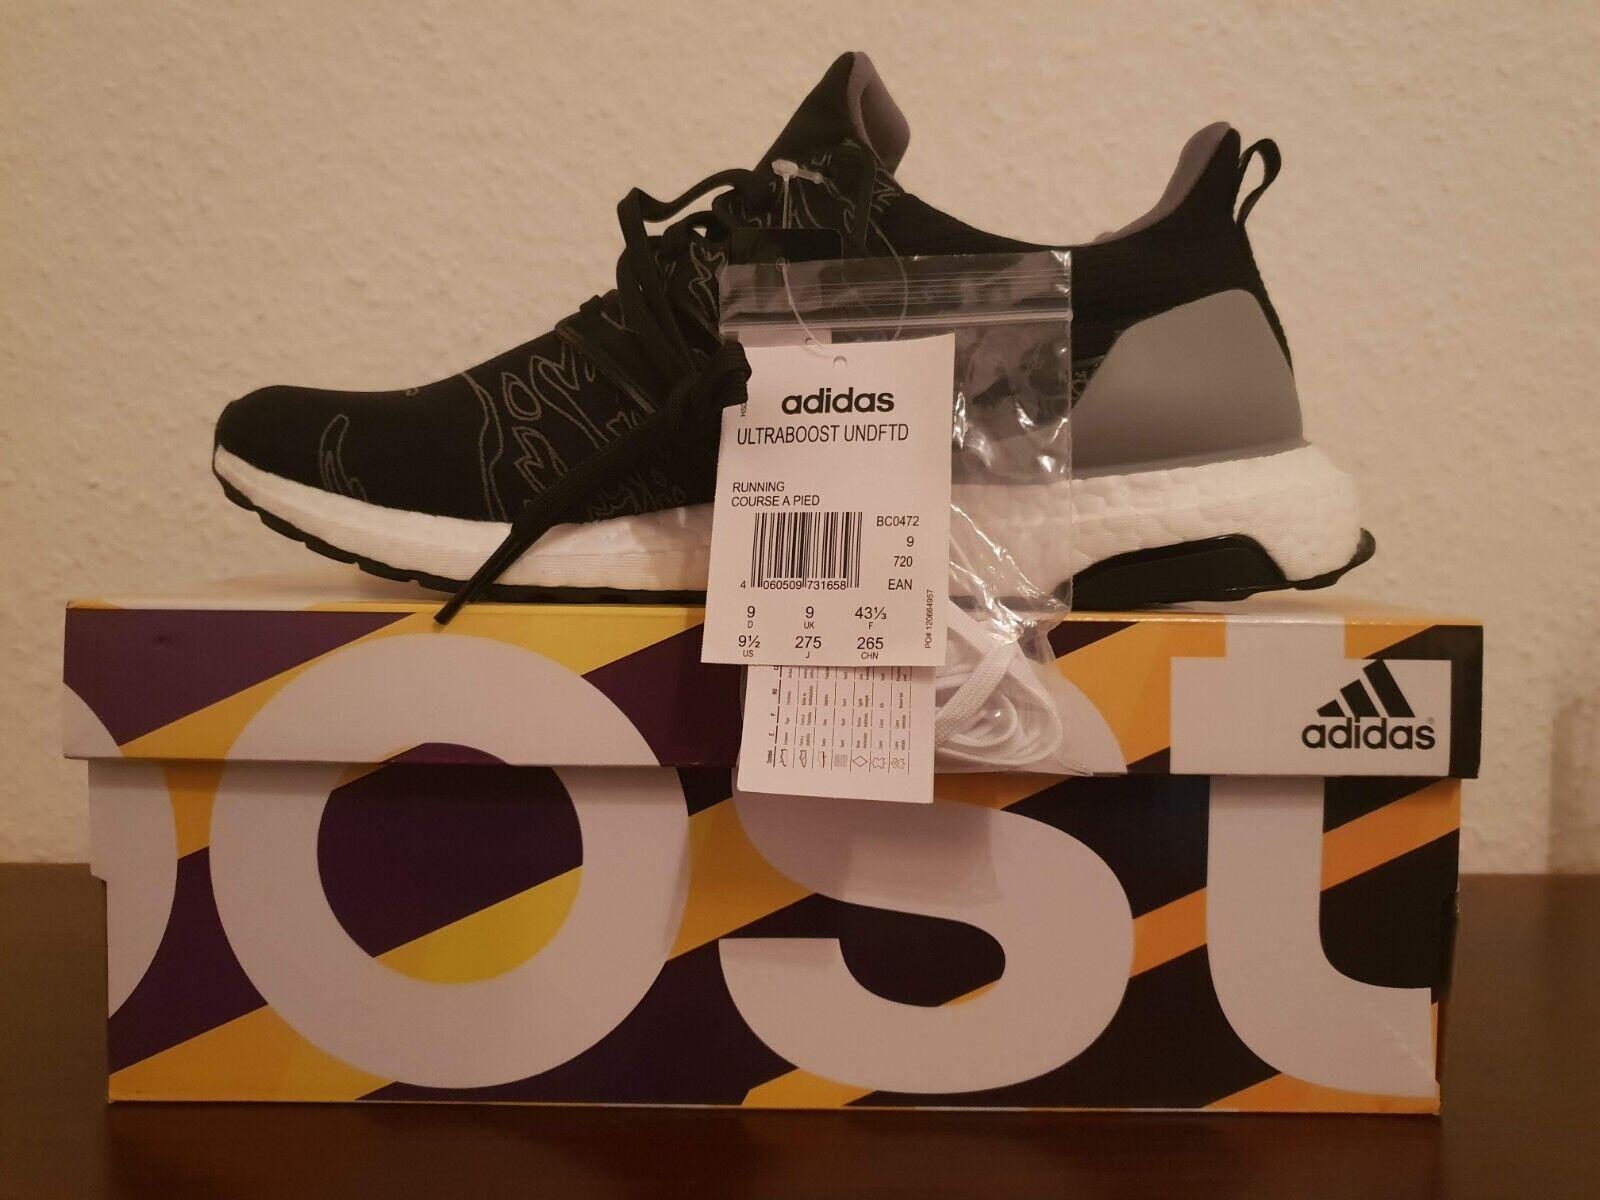 Undefeated x Adidas Ultra Boost BC0472 EU 43 1 3  US 9,5  UK9 Yeezy Travis Scott